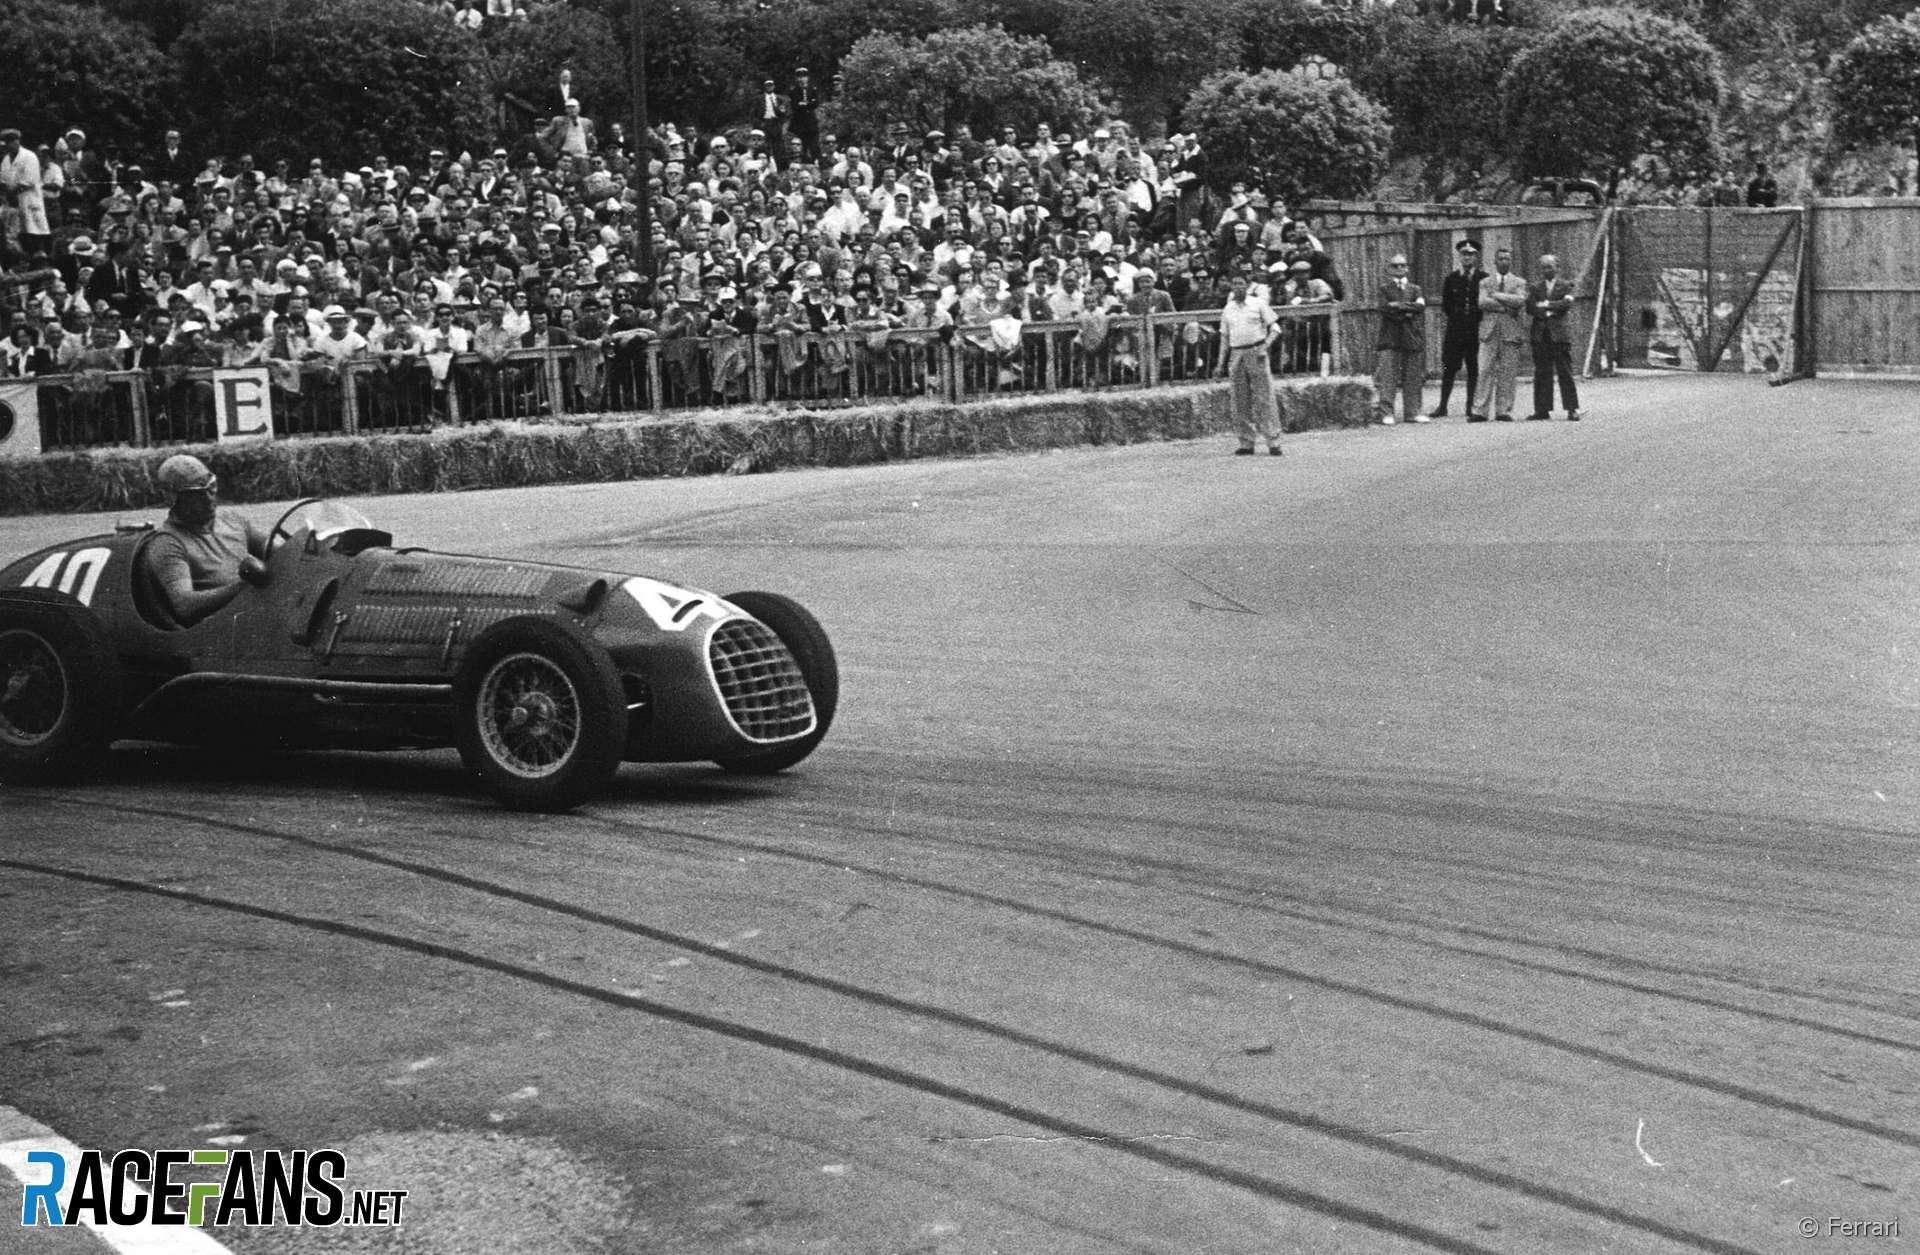 Alberto Ascari, Ferrari, Monaco, 1950